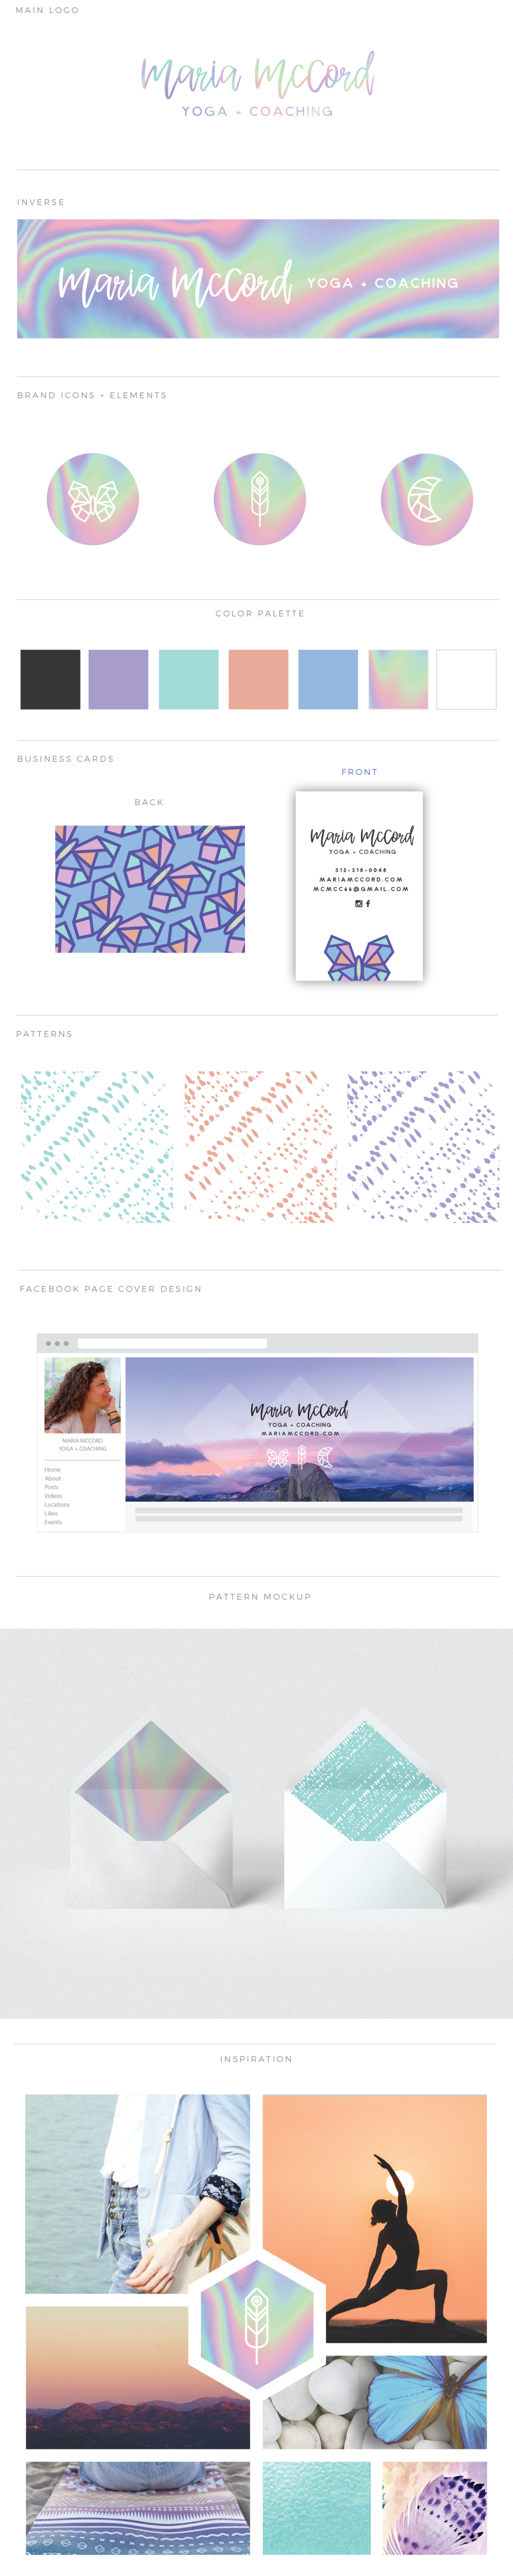 Maria_McCord_Brand Board.png